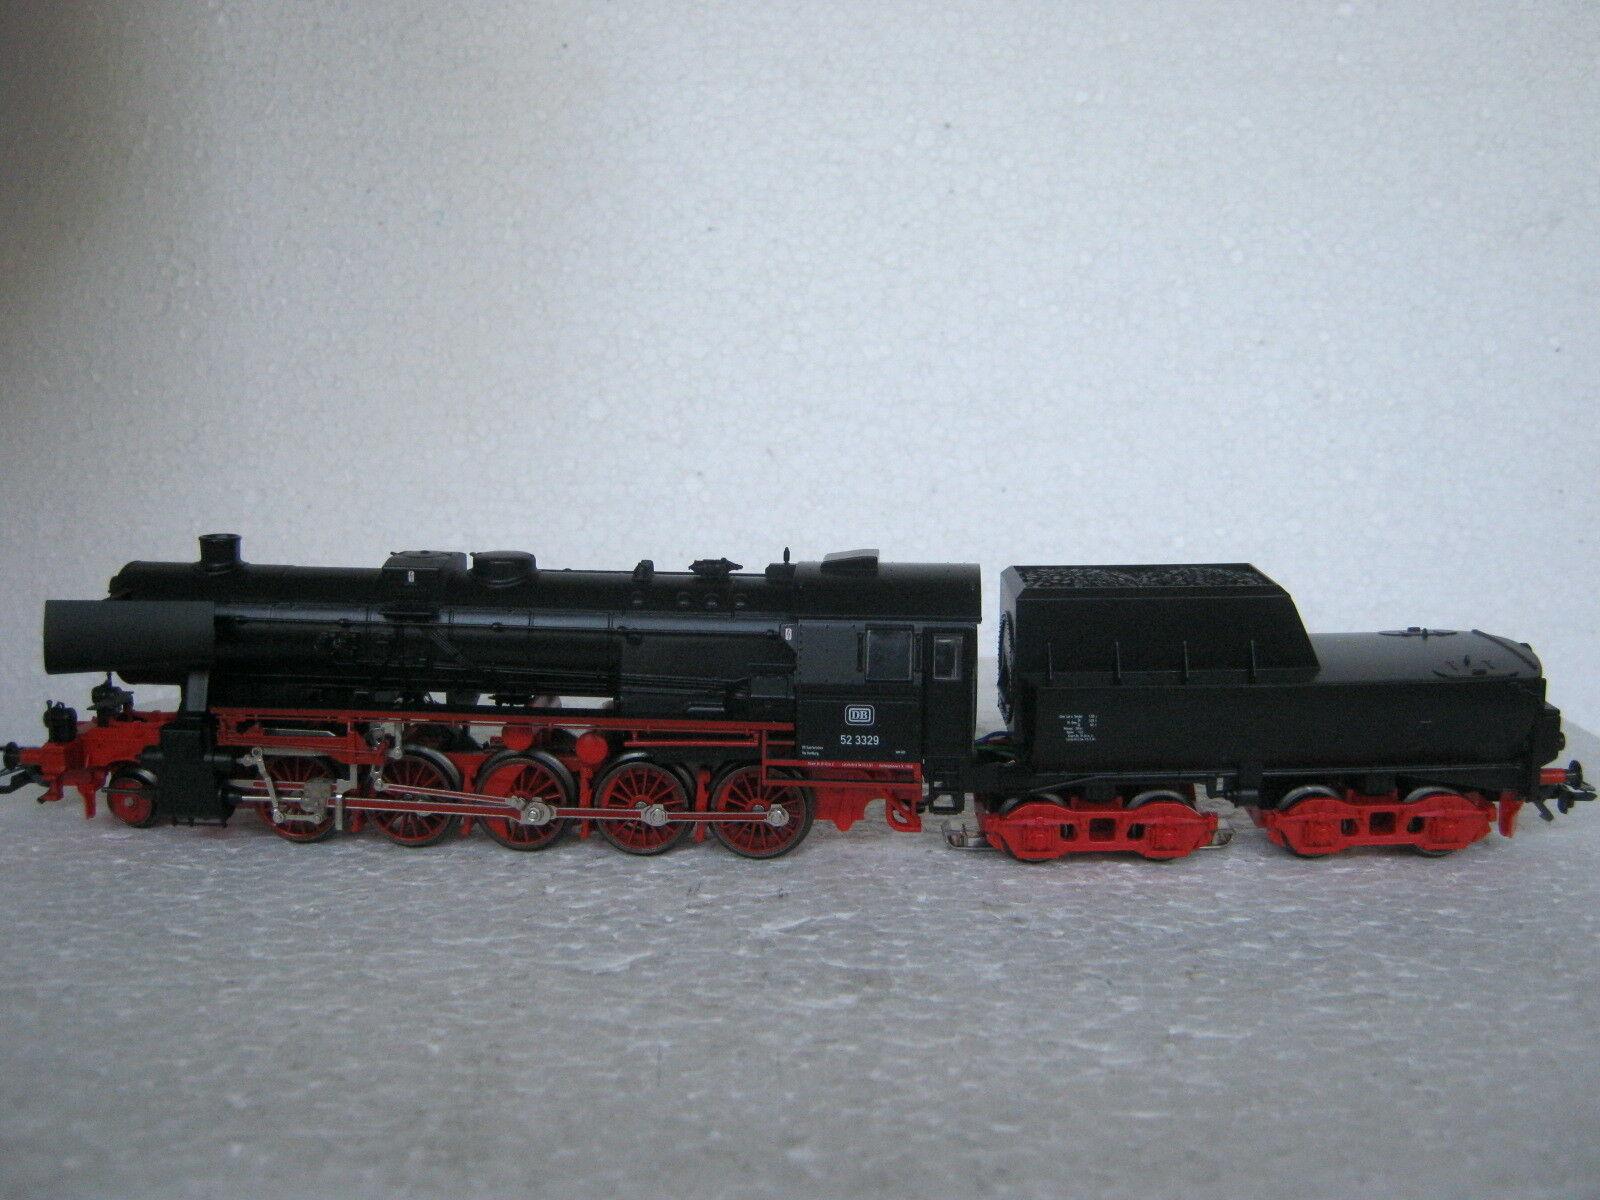 Digital   HO/AC 3415 a Vapore Locomotiva Br 52 3329 DB  co/183-89r7/10